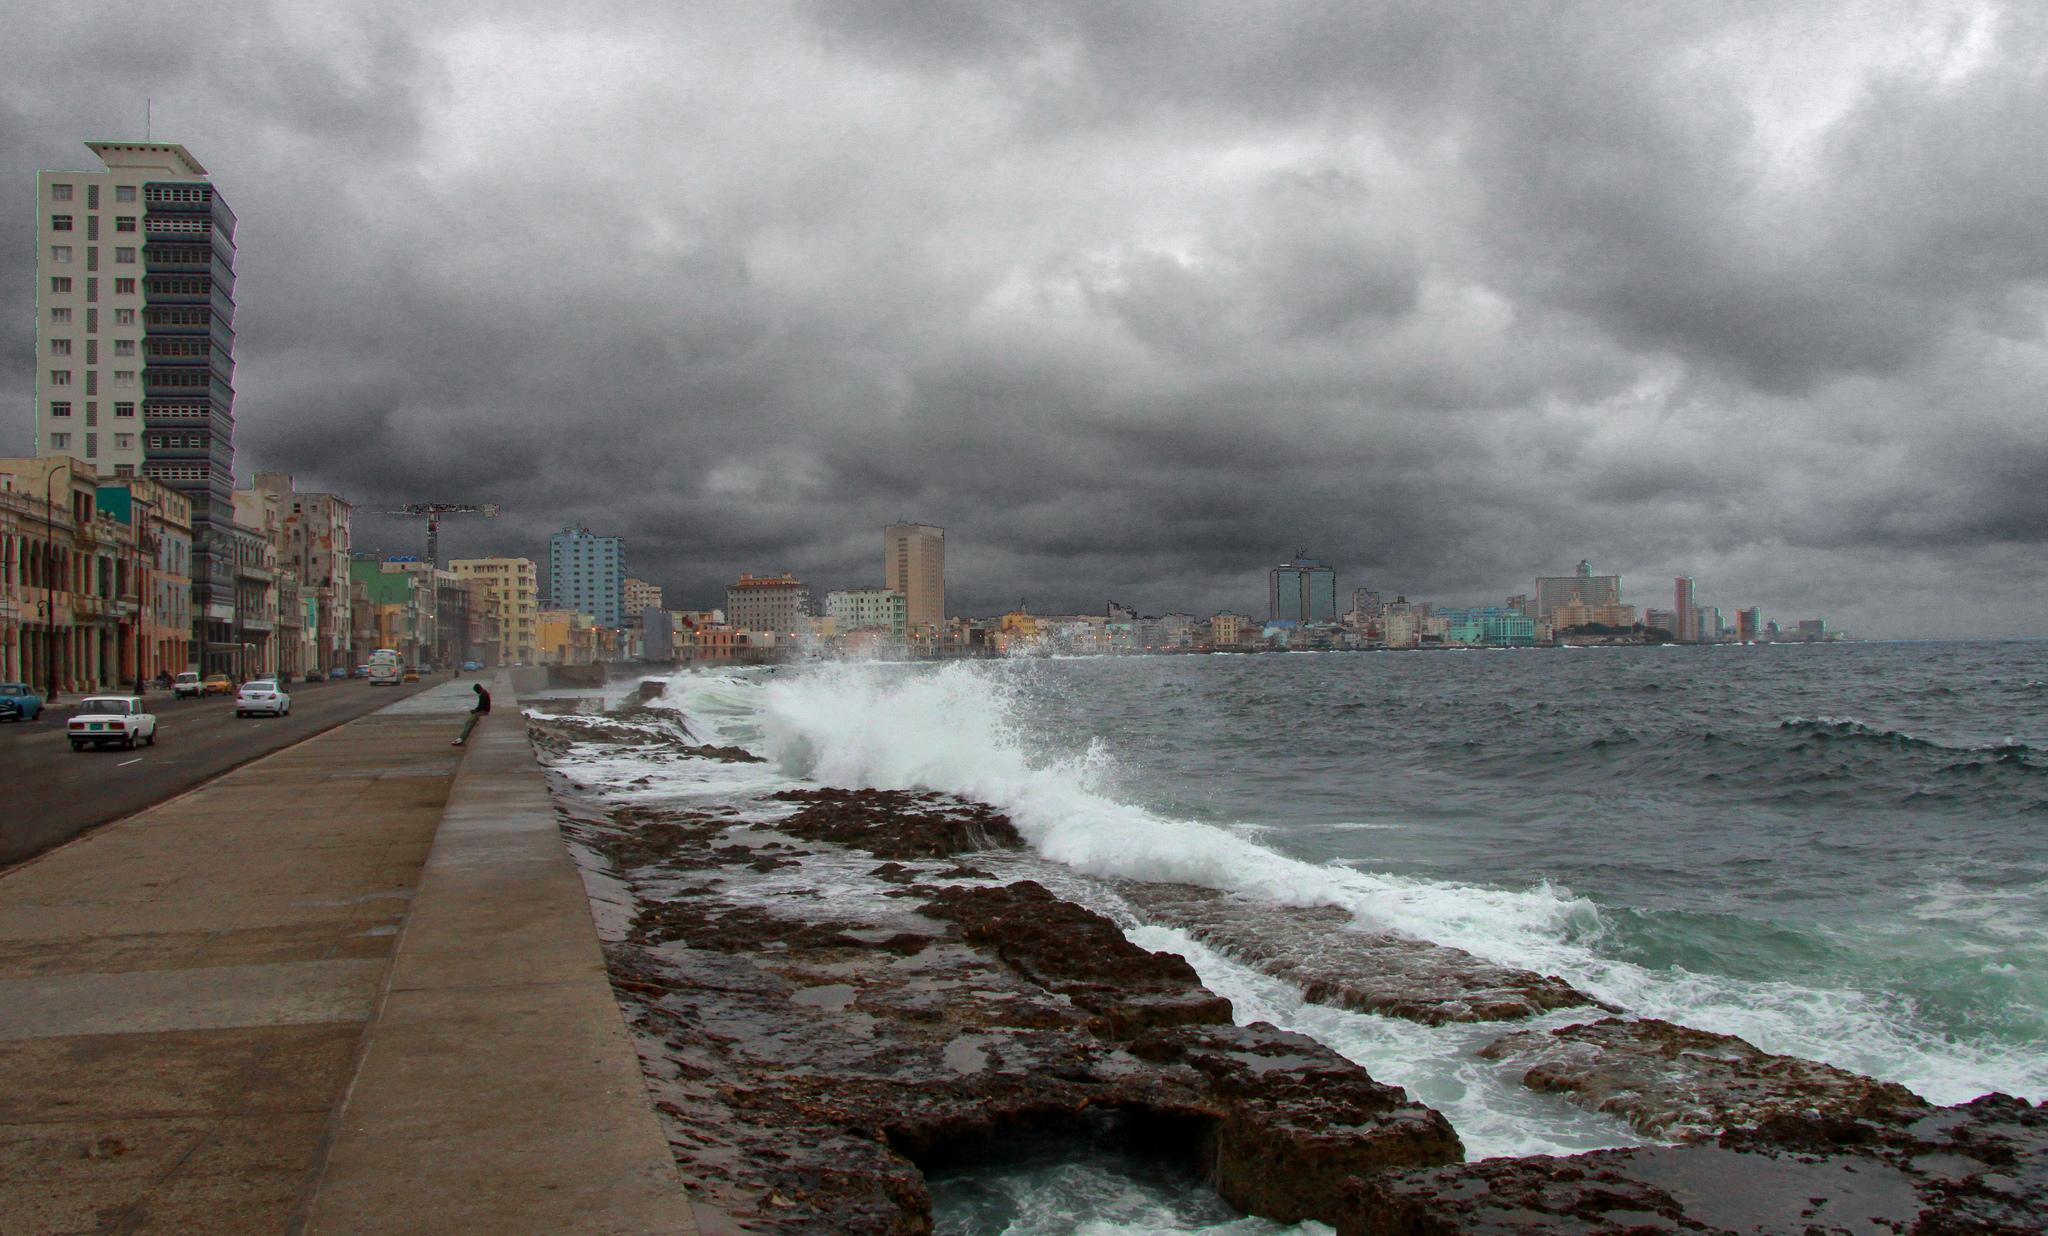 The Malecon in Havana. Photo: Guillaume Baviere.